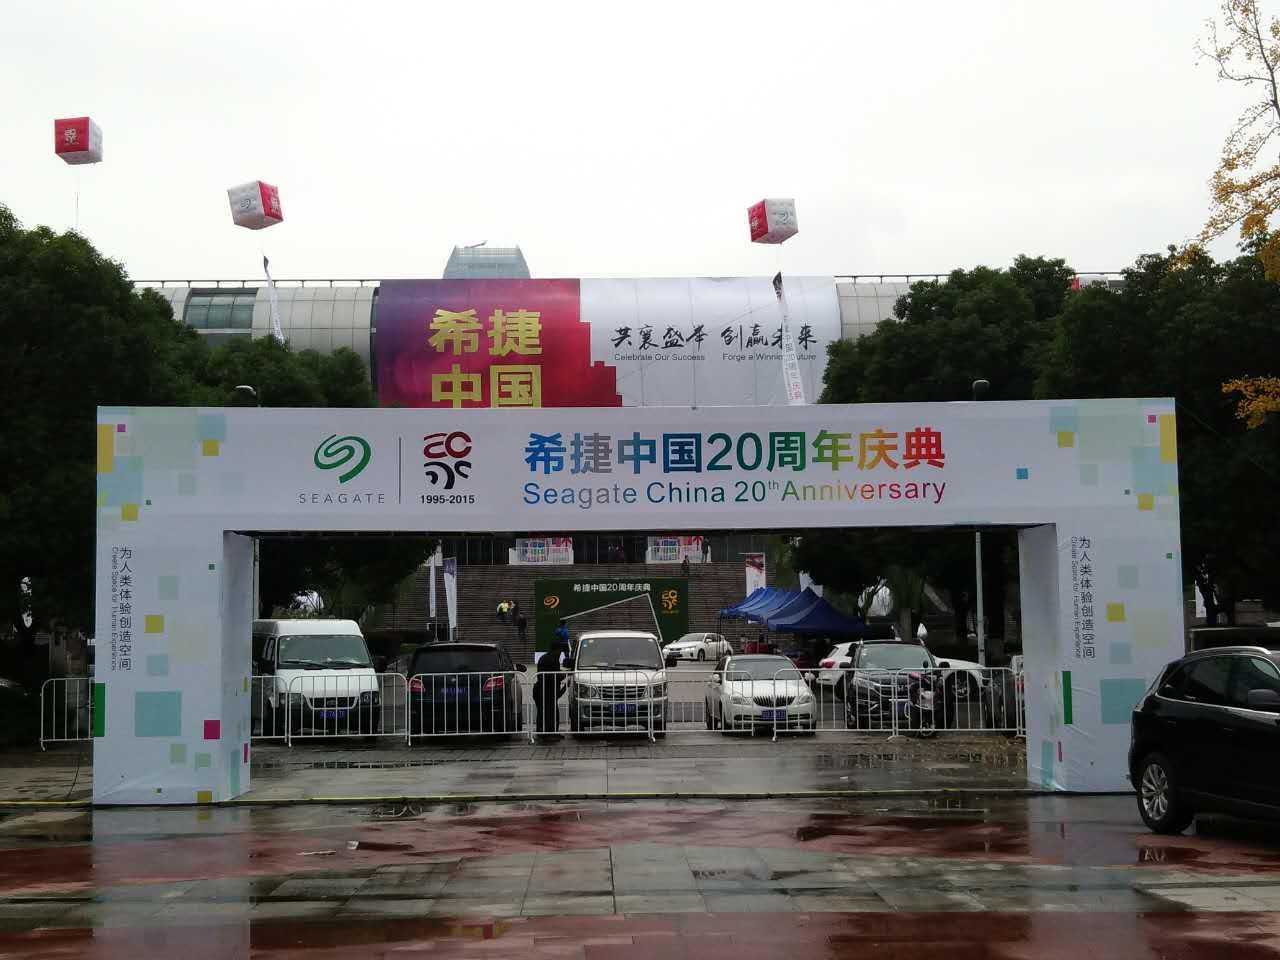 【IT最大声11.18】希捷进入中国20周年 成绩斐然